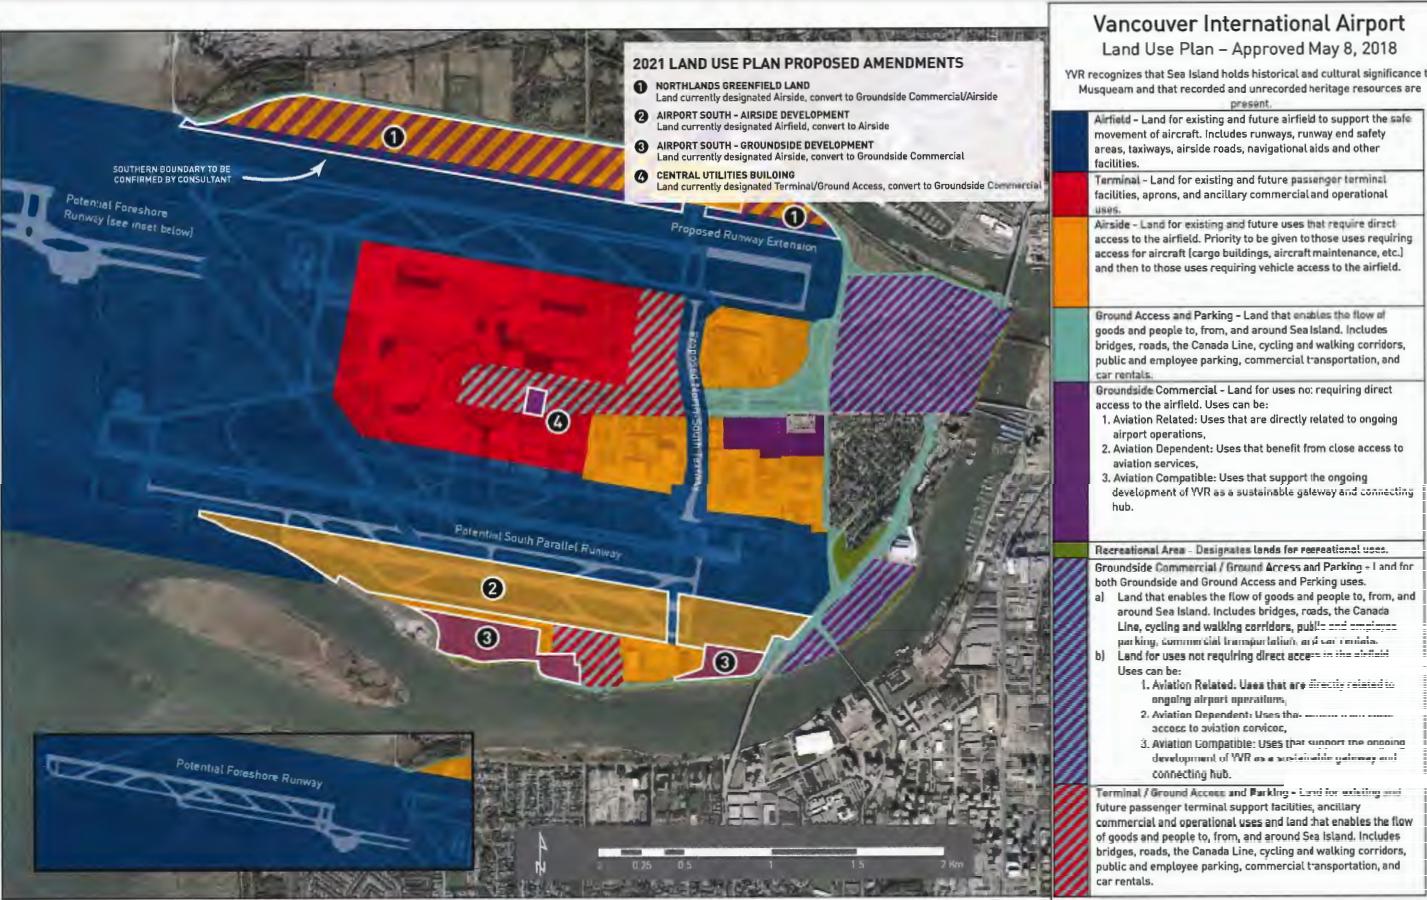 vancouver international airport yvr 2021 land use amendments